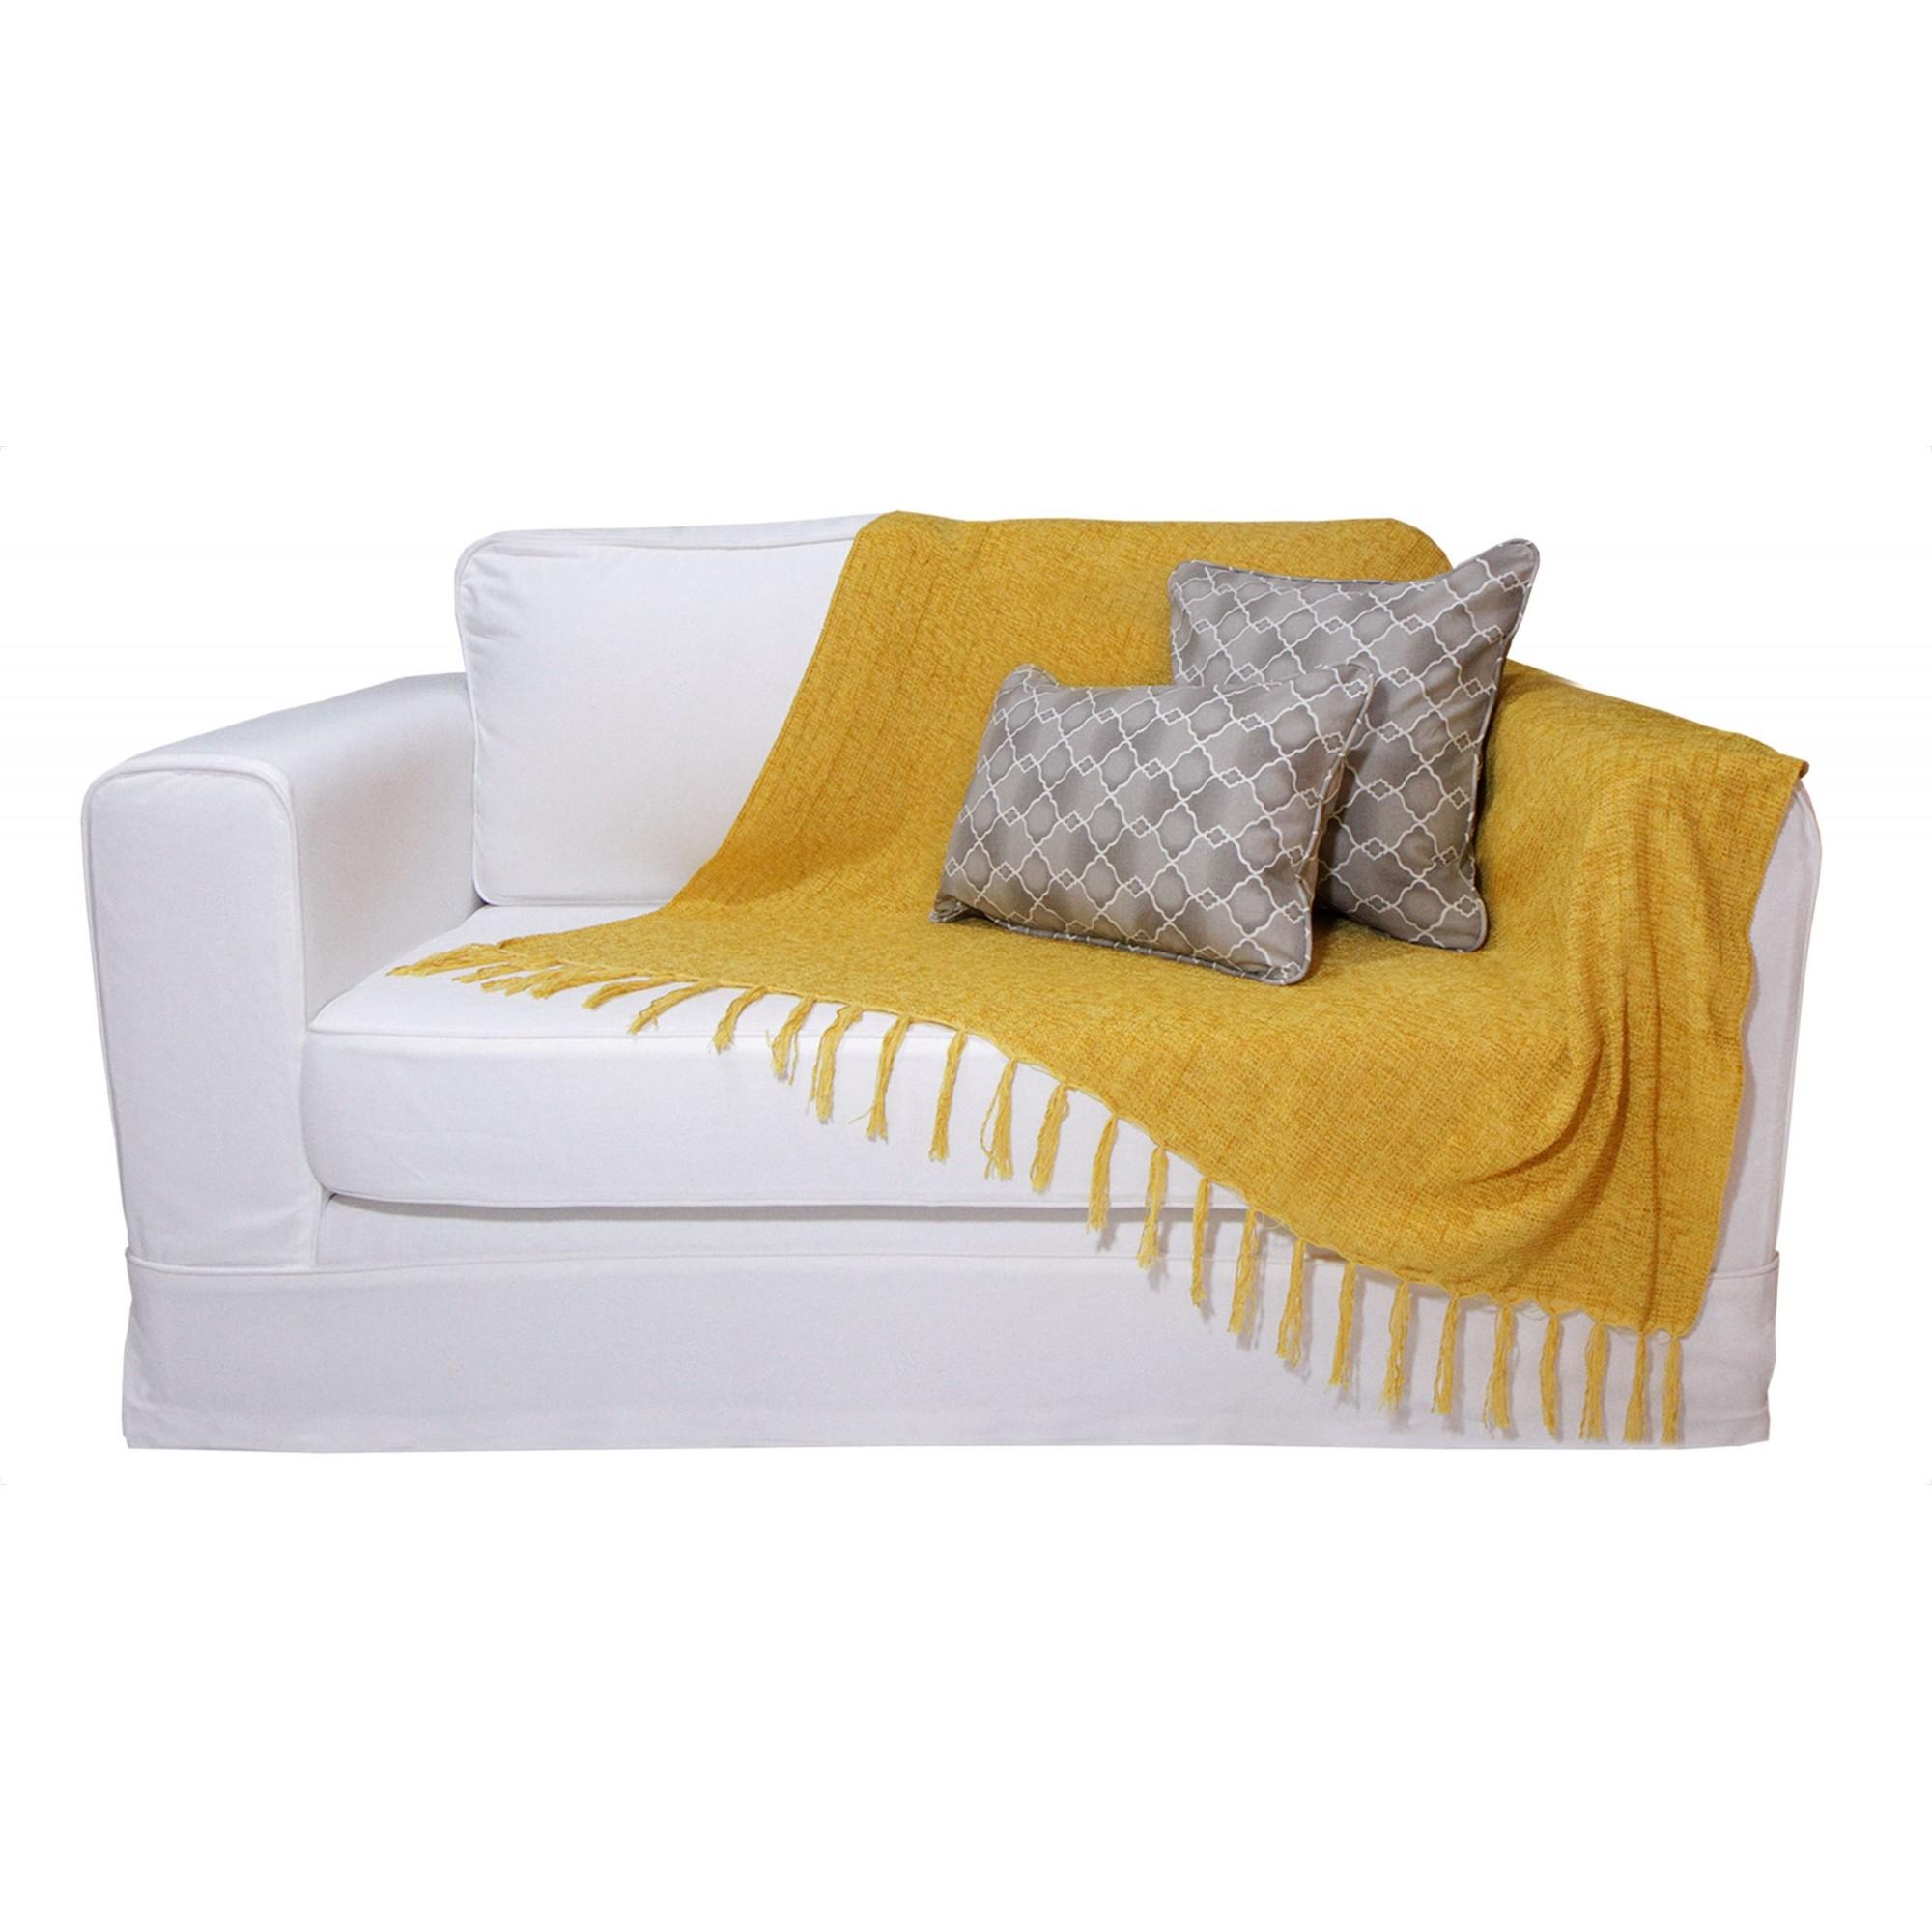 Manta Chenille Amarela 1,20m x 1,80m